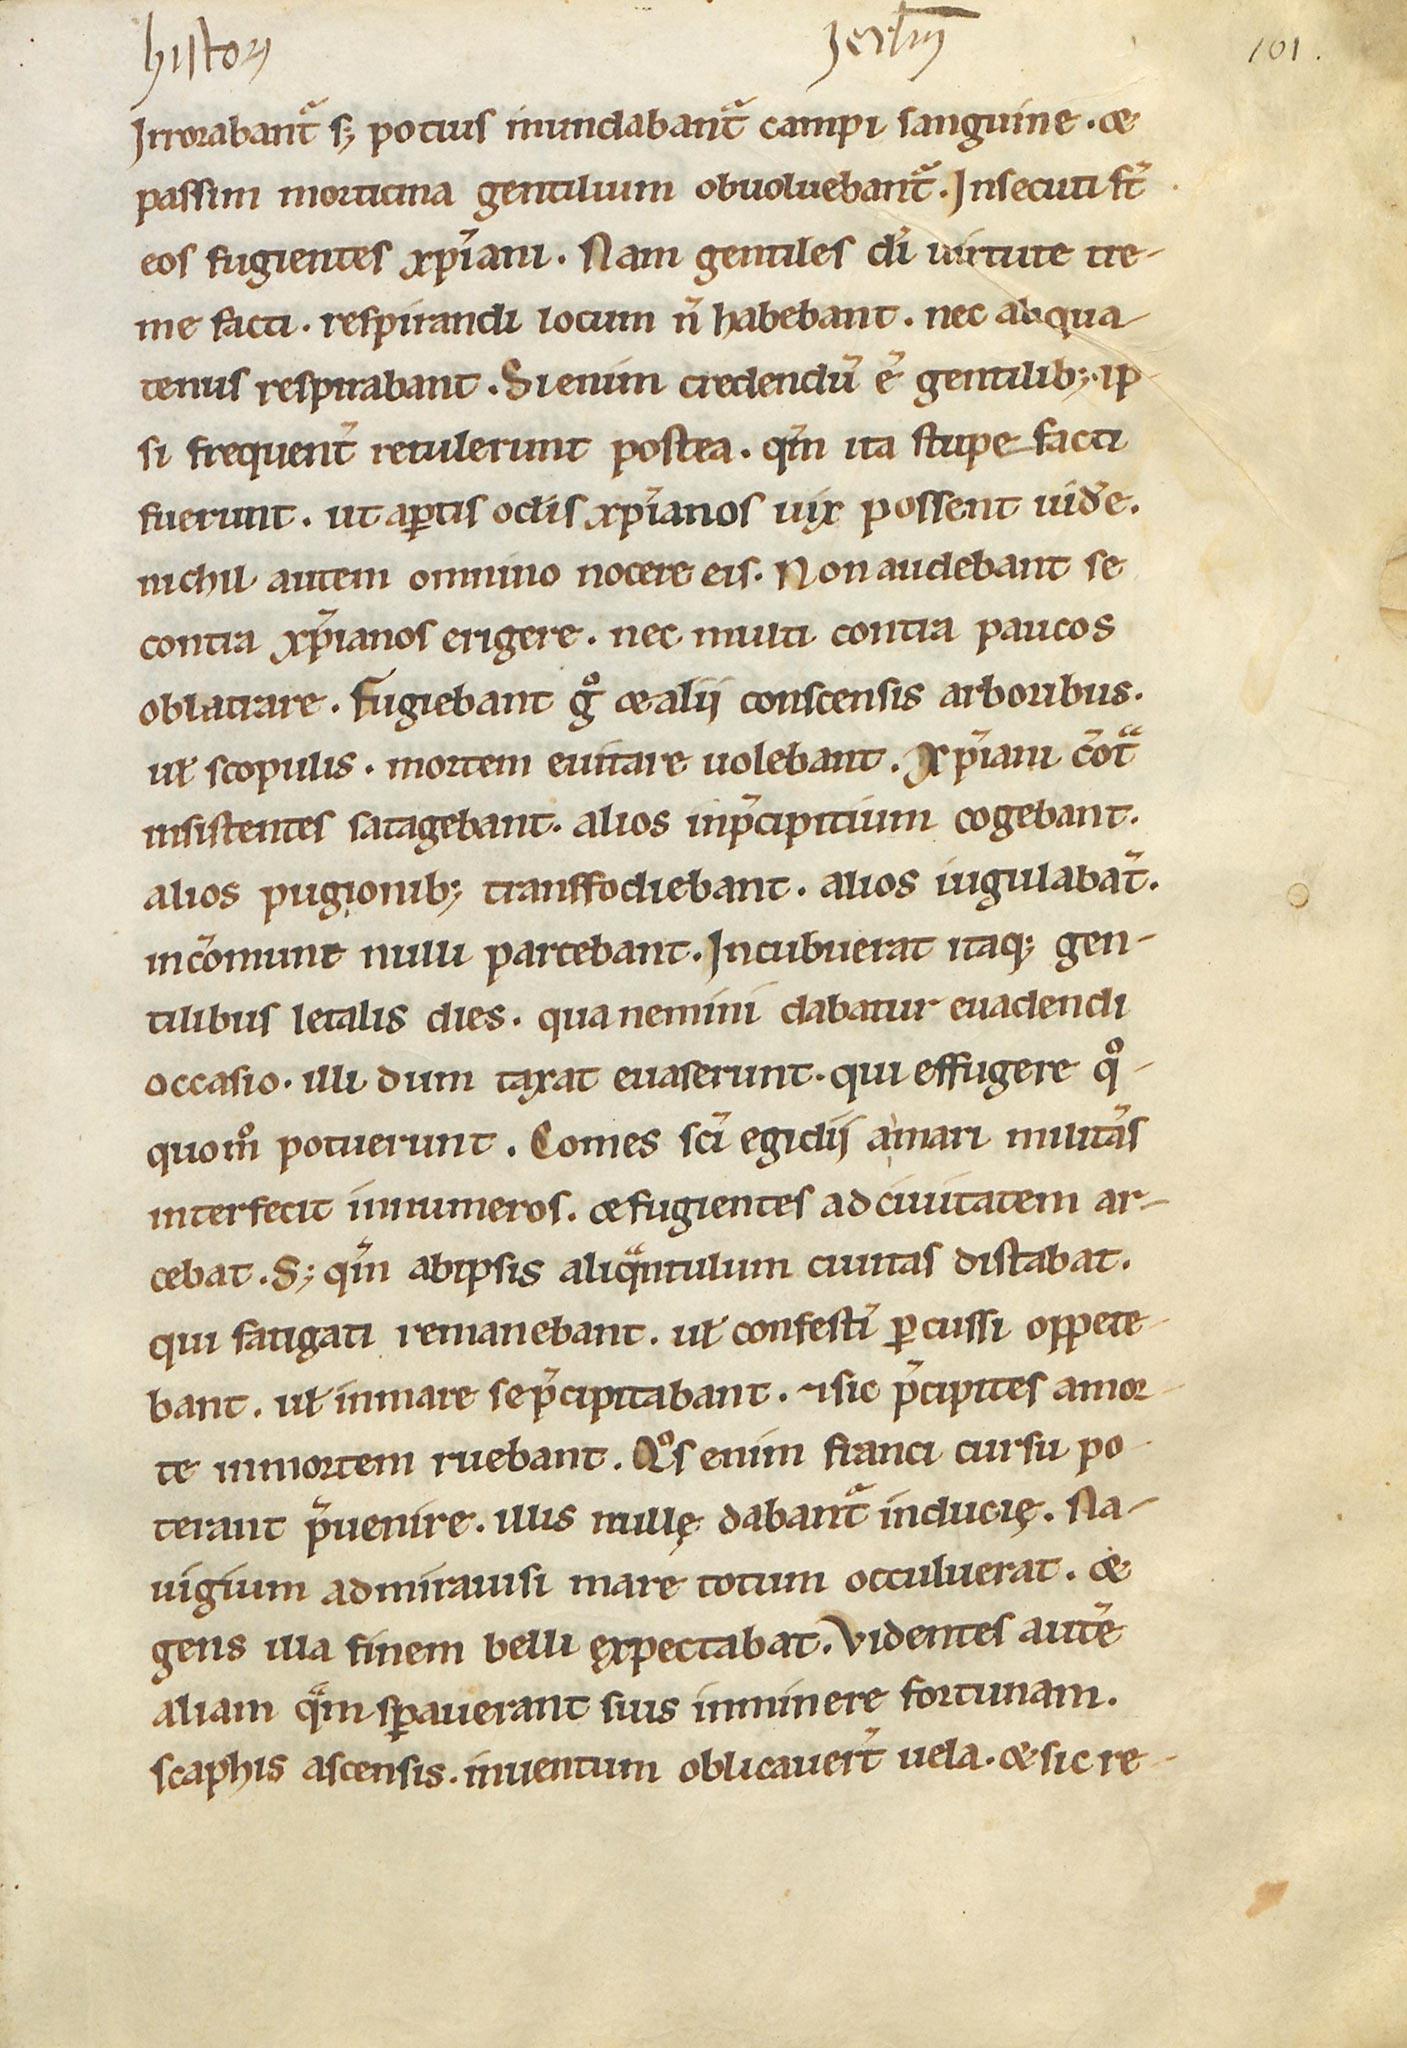 Manuscrit-Historia-Hierosolimitana-101r°